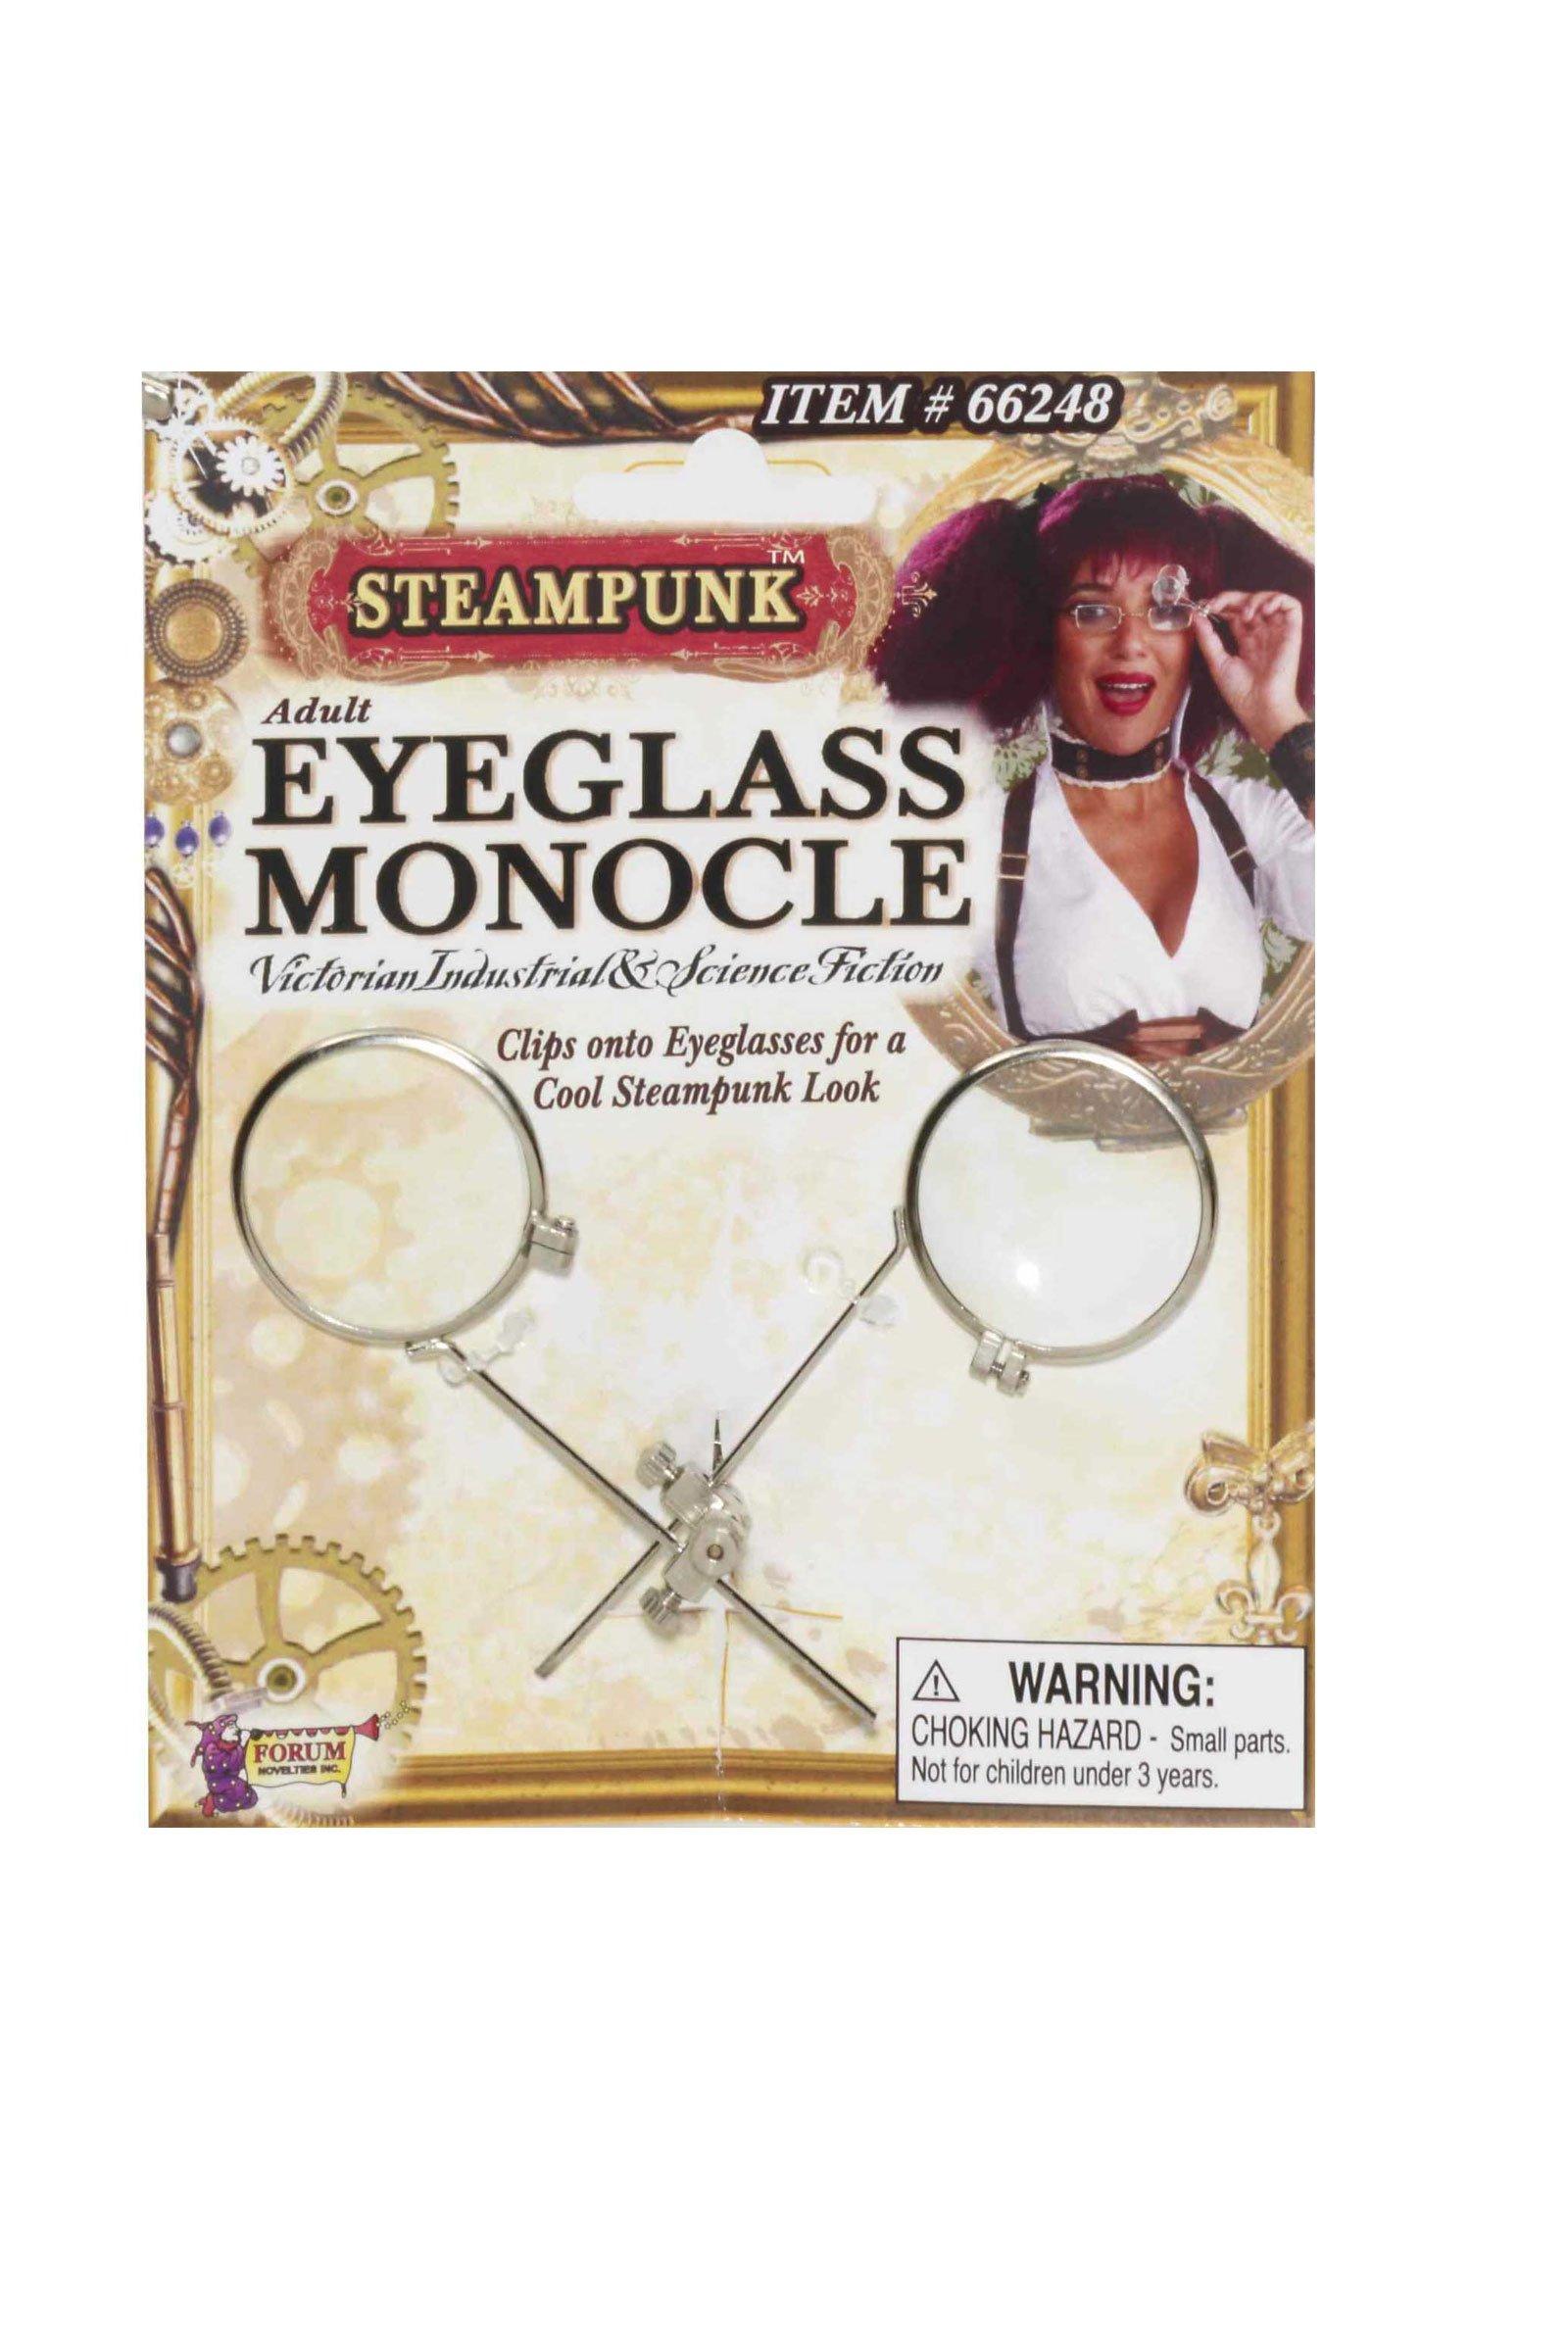 Steampunk Eyeglass Monocle Clip Costume Accessory